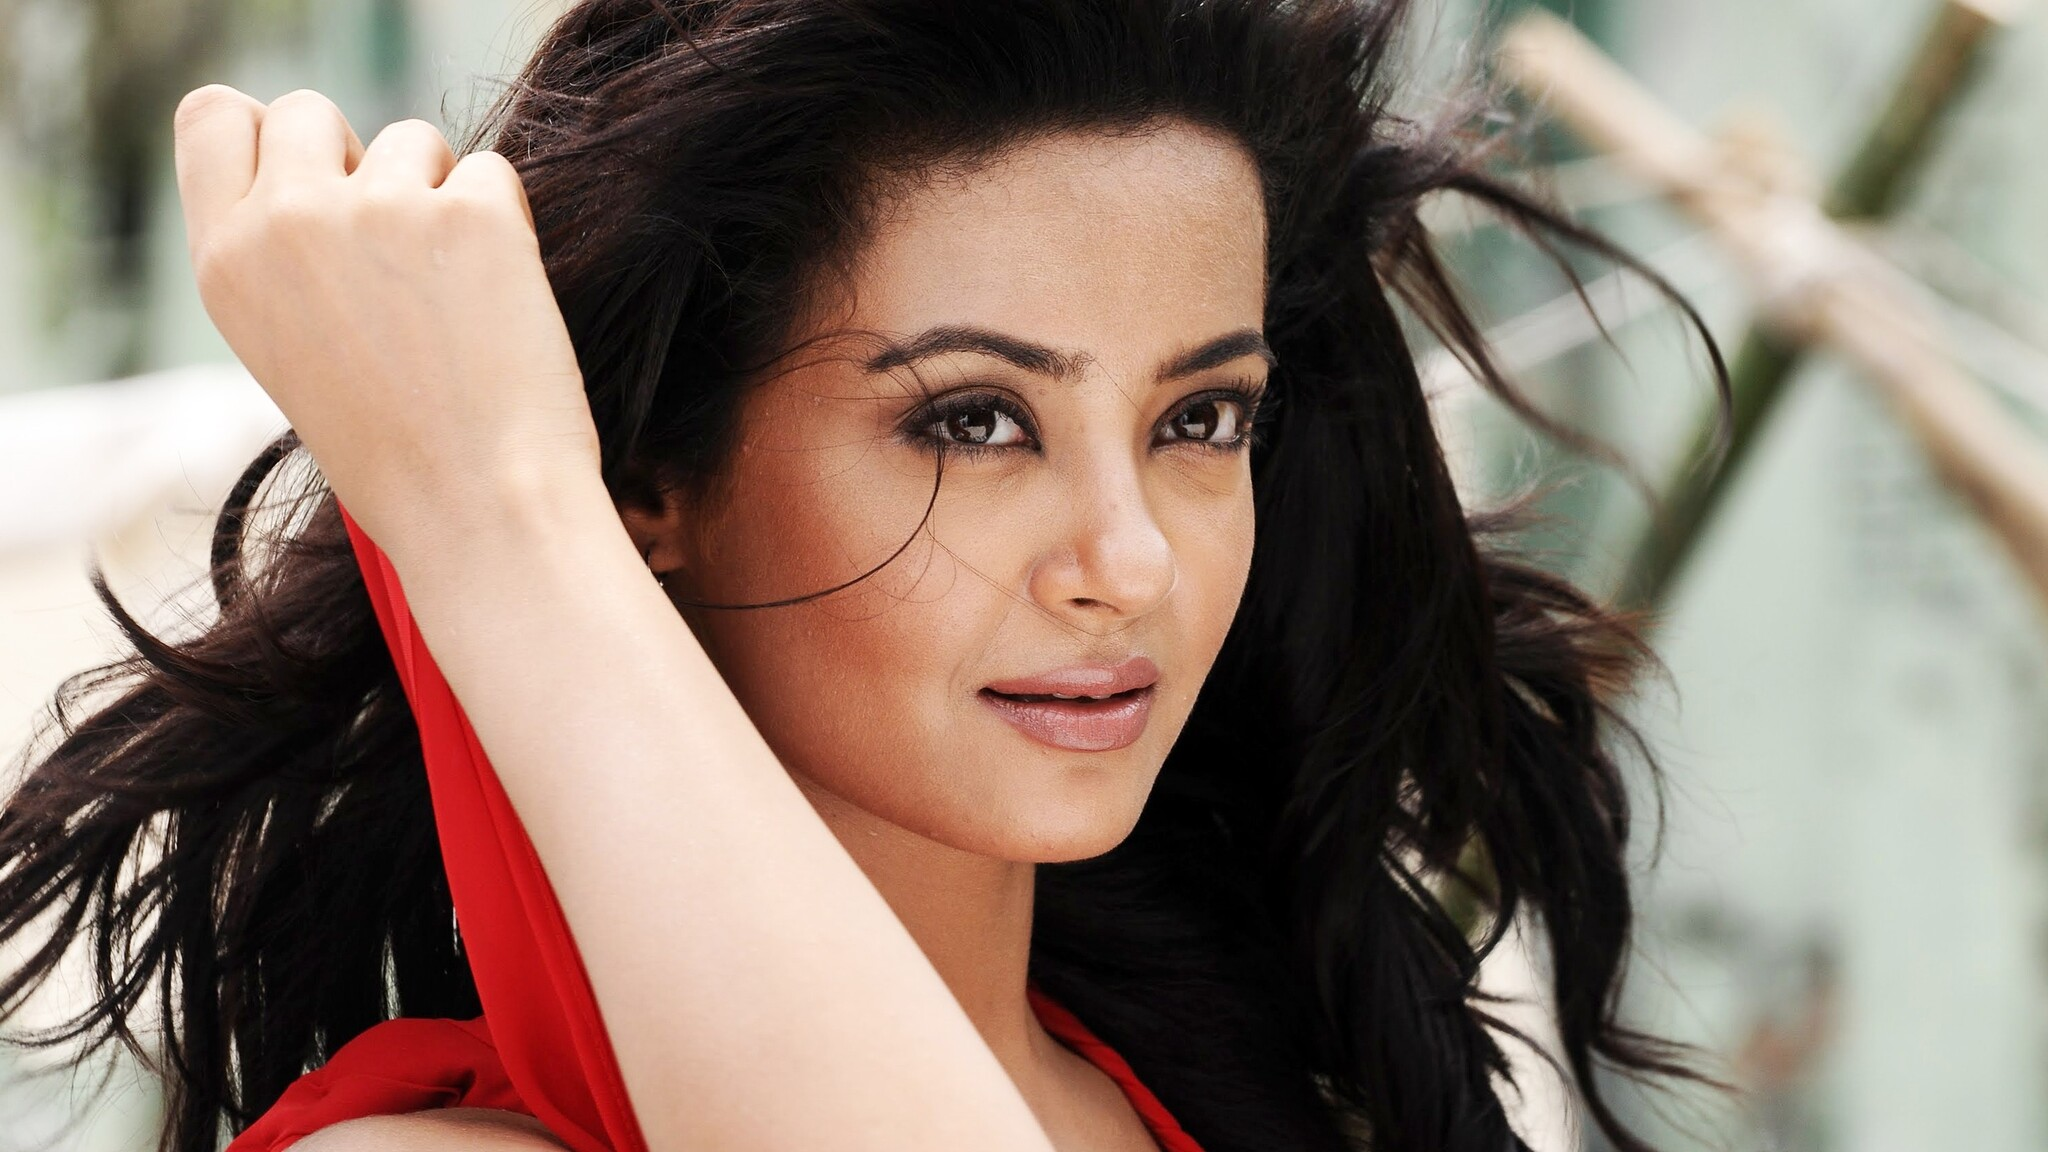 2048x1152 surveen chawla punjabi actress 2048x1152 resolution hd 4k